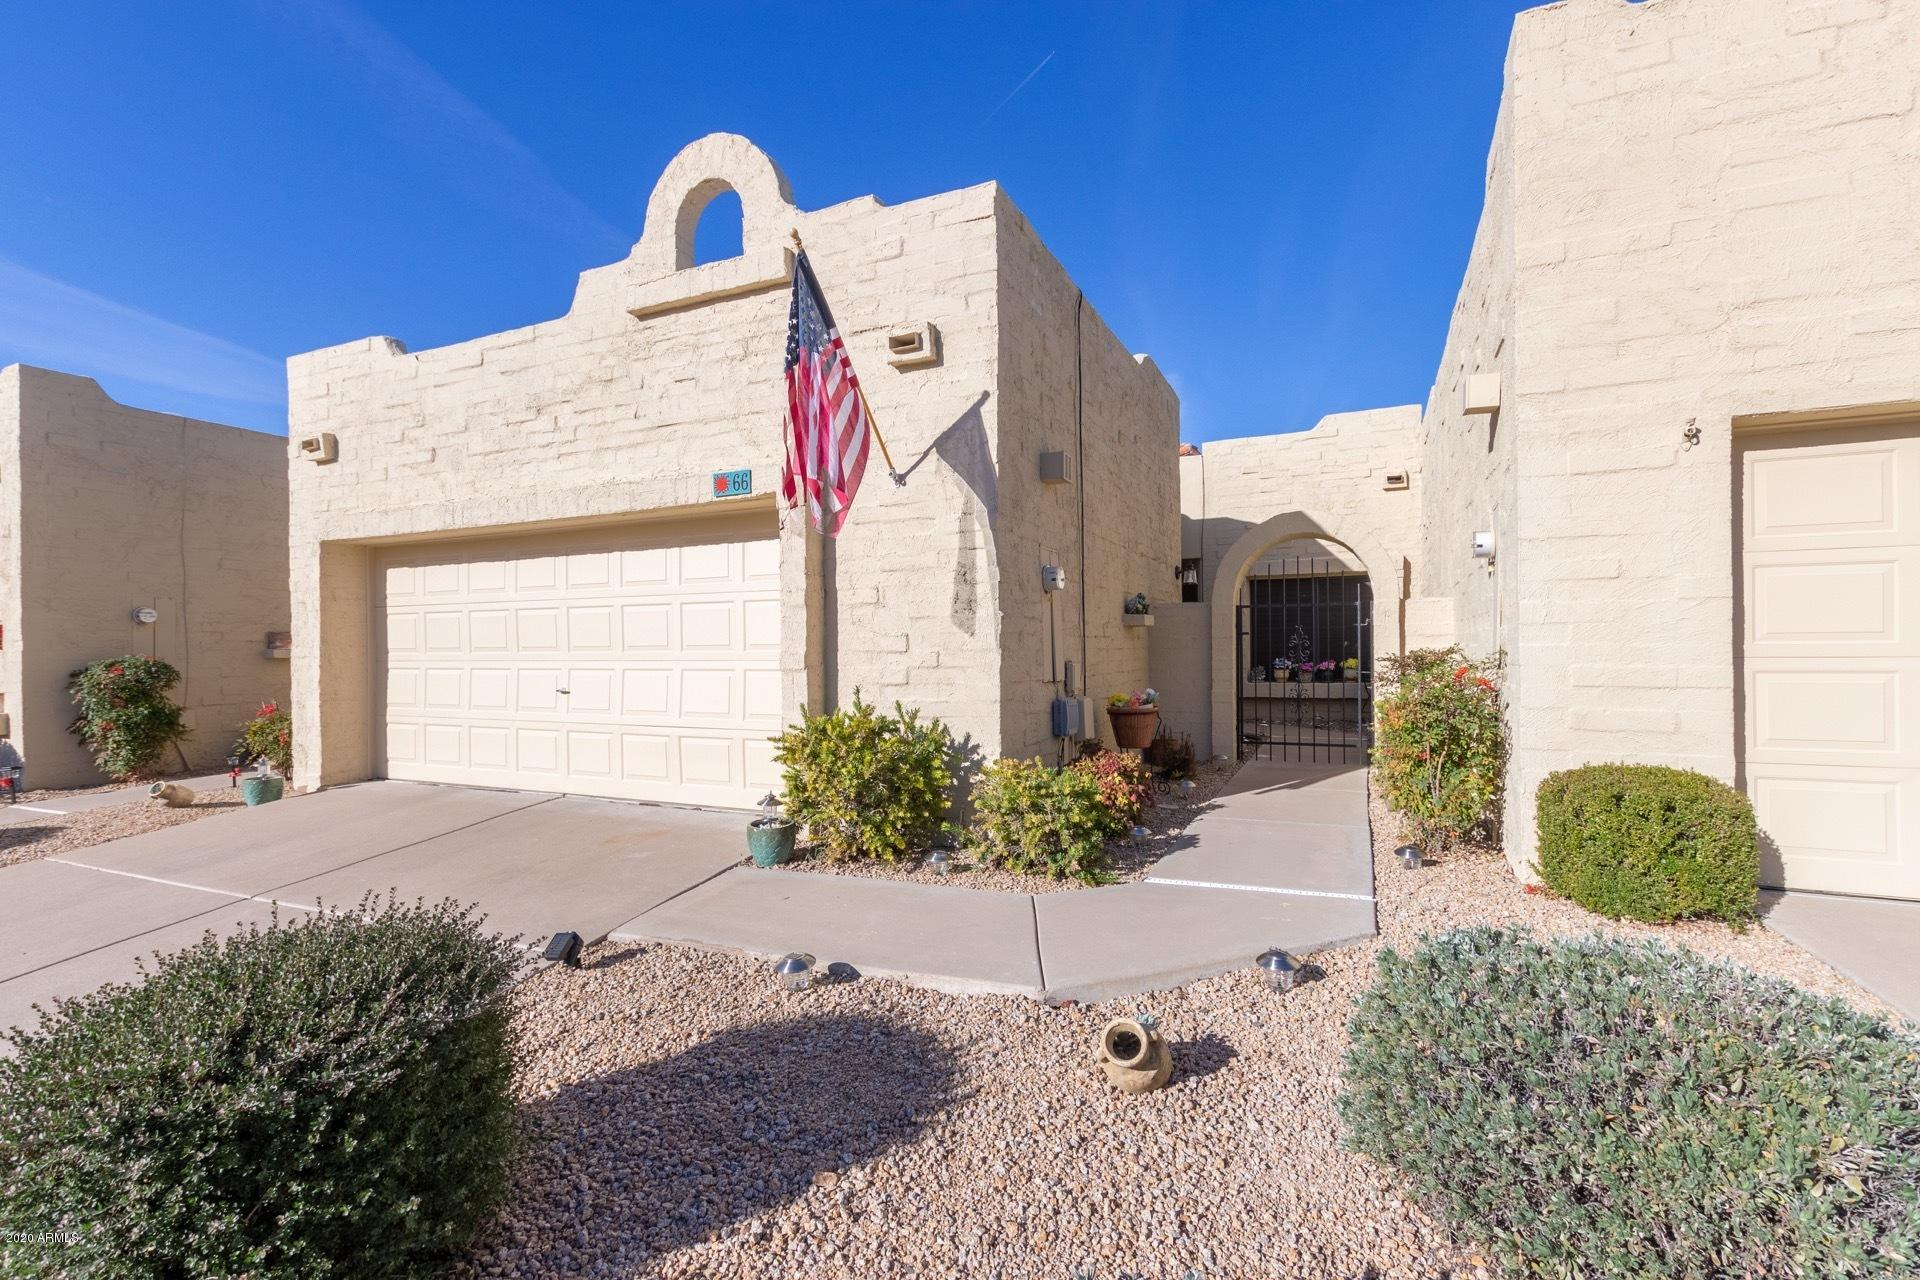 Photo of 1235 N SUNNYVALE -- #66, Mesa, AZ 85205